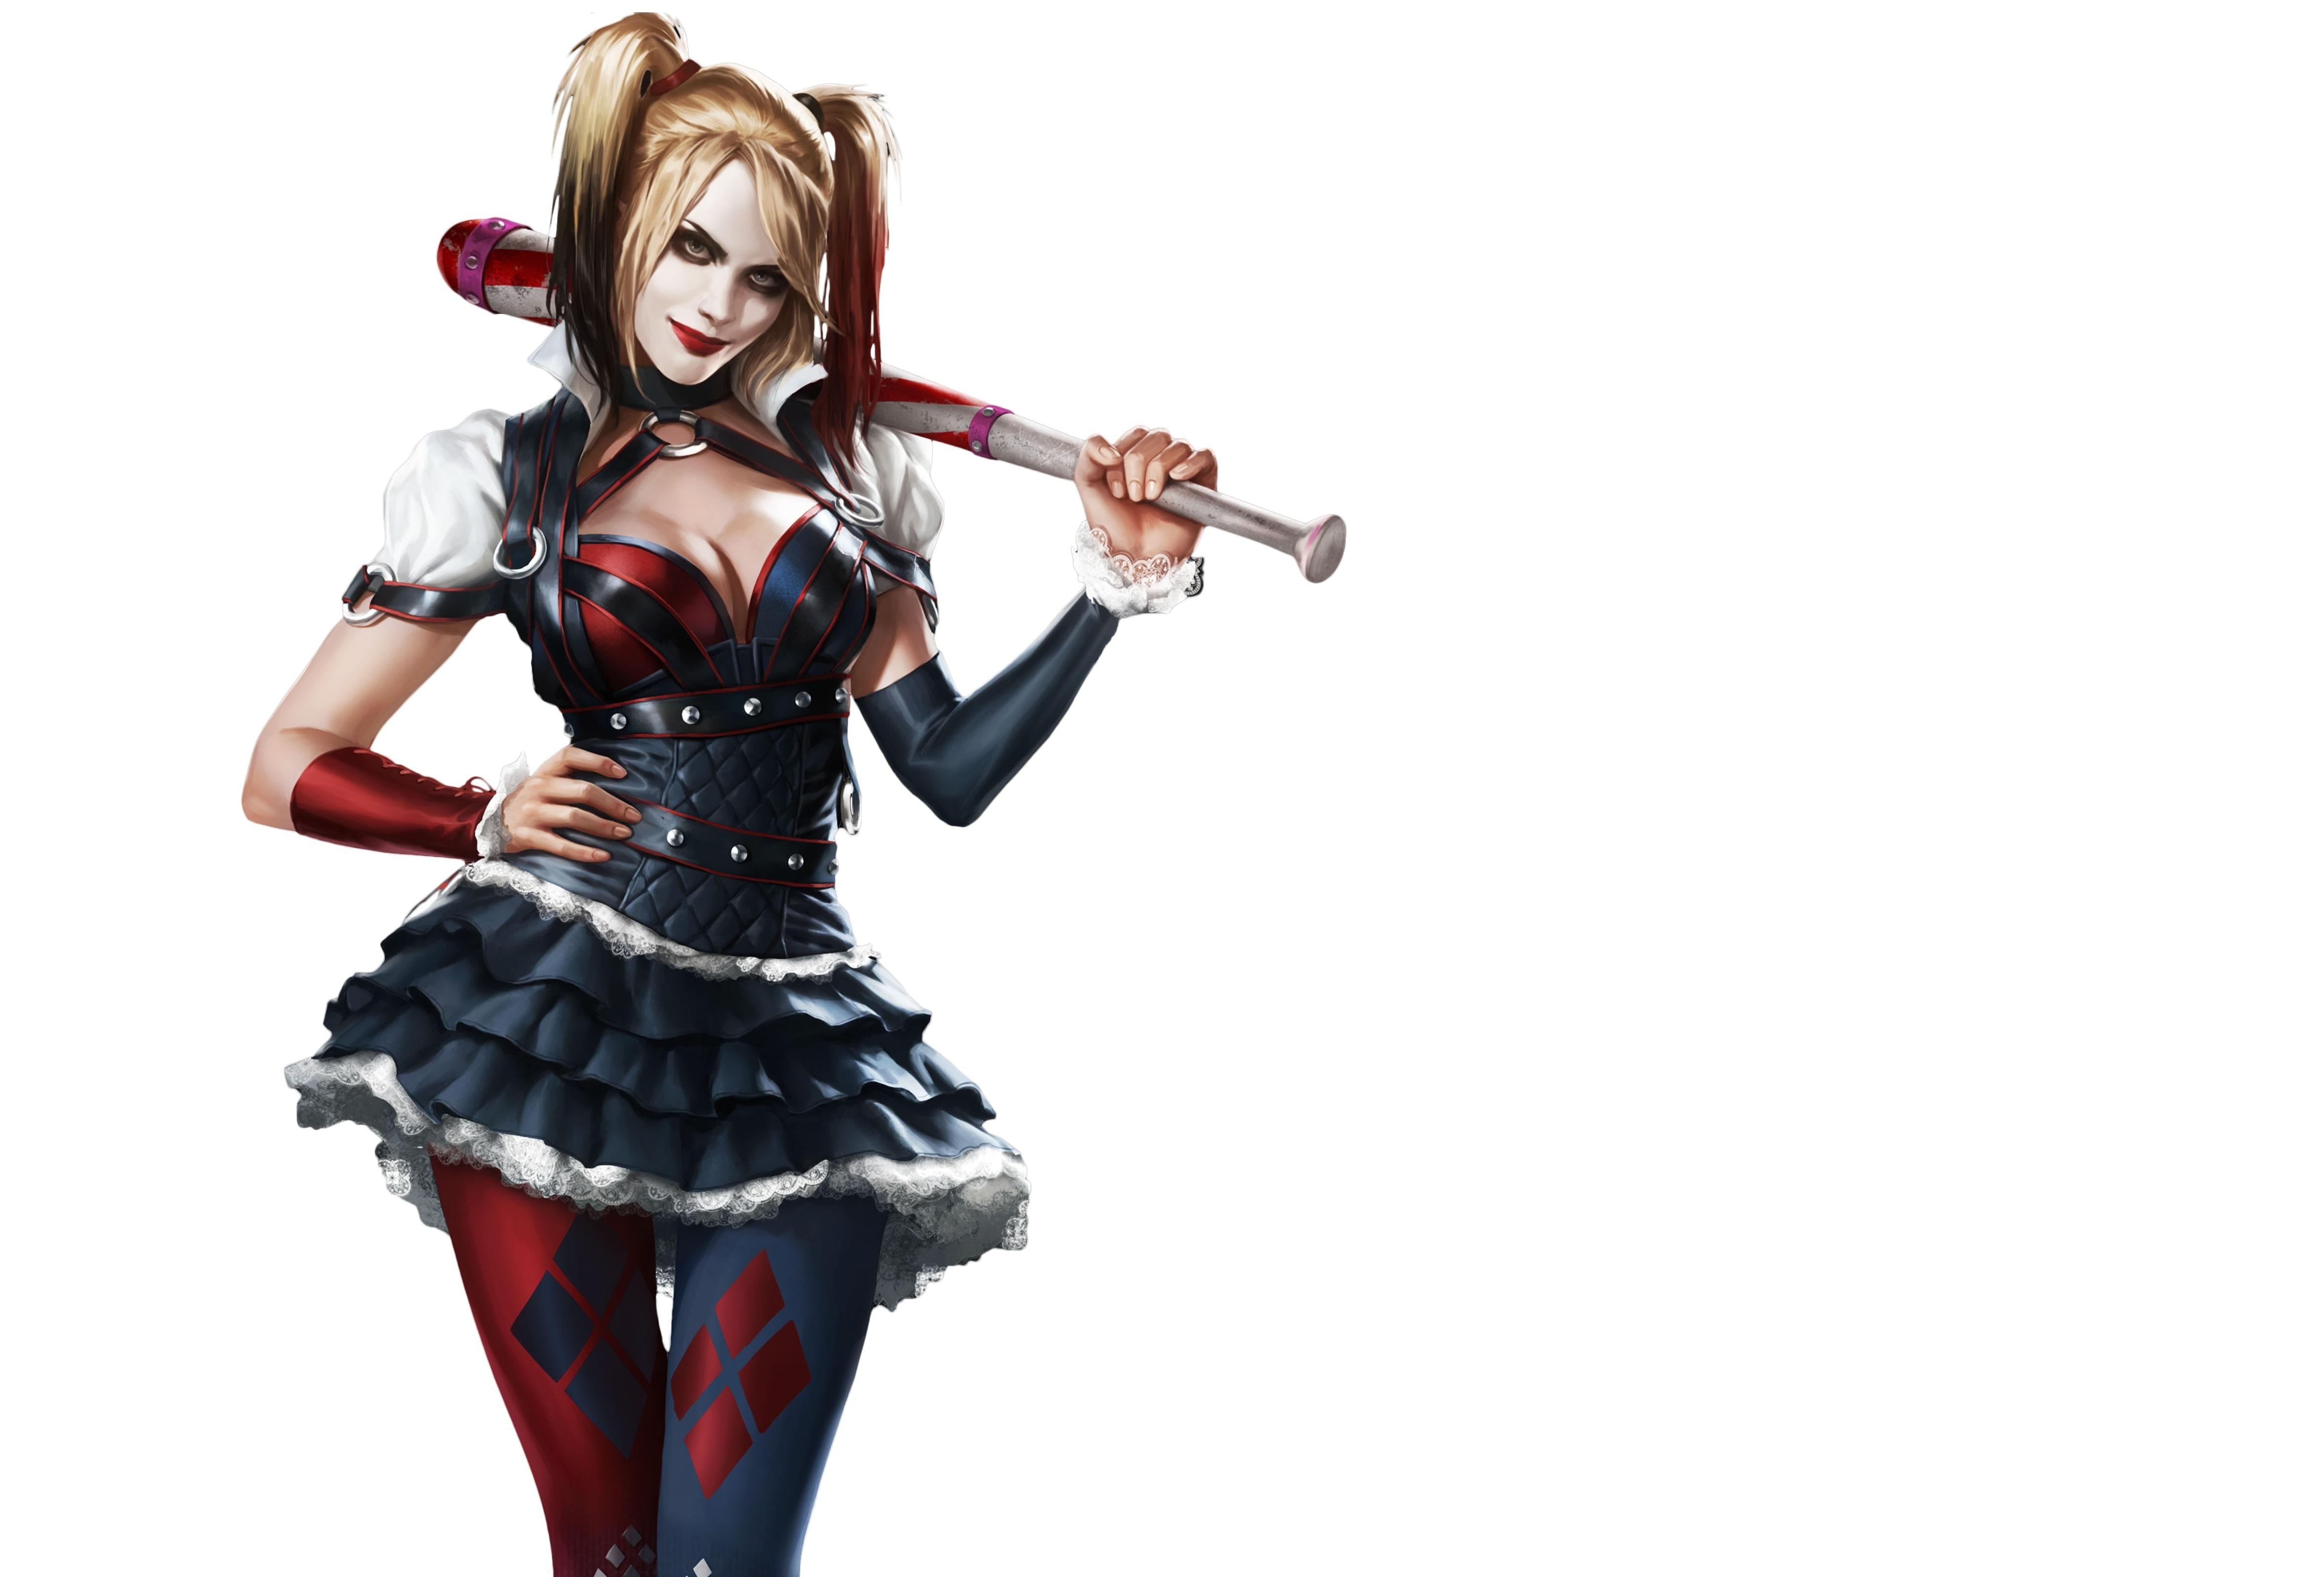 Wallpaper Batman Superheroes Skirt Harley Quinn Hero 4703x3192